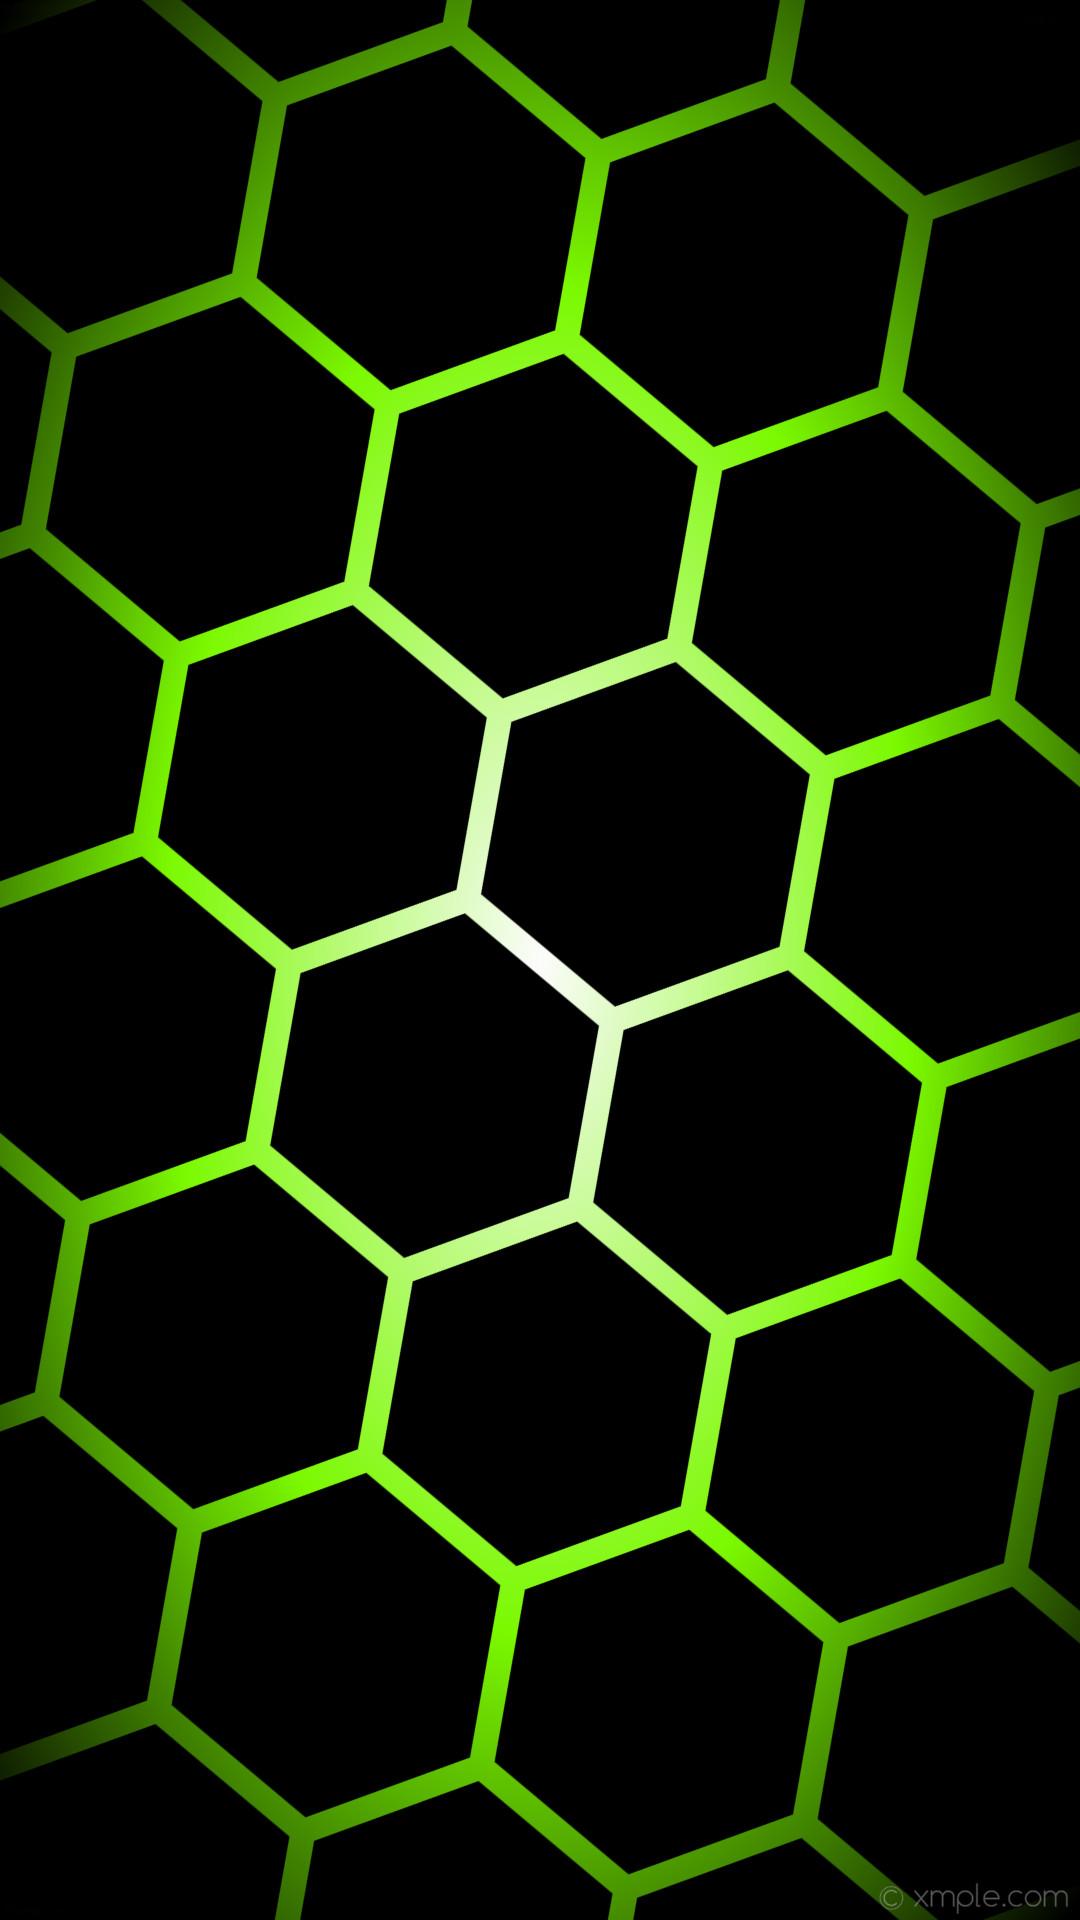 wallpaper glow hexagon black white green gradient lawn green #000000  #ffffff #7cfc00 diagonal